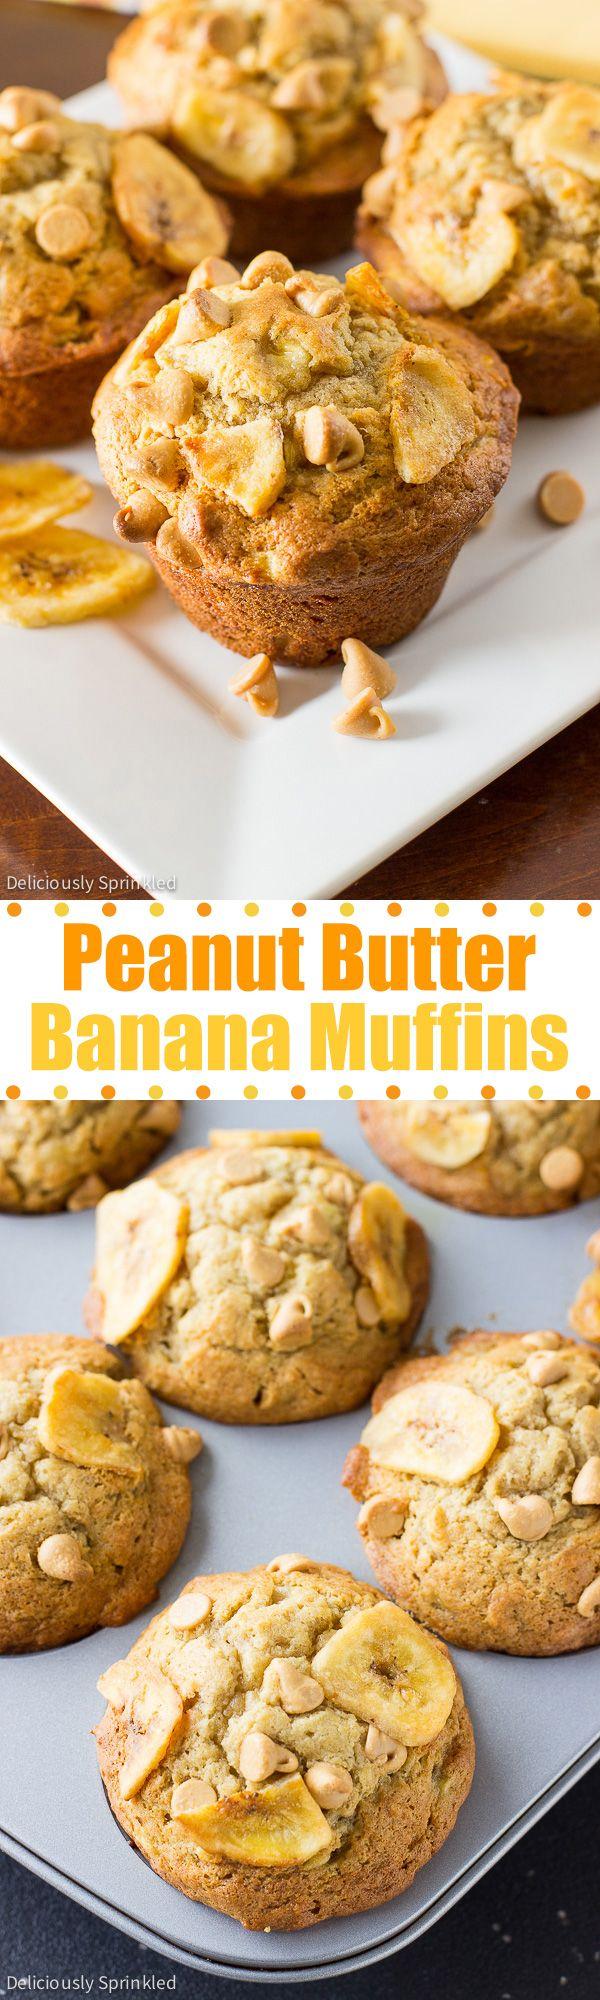 The BEST Peanut Butter Banana Muffins